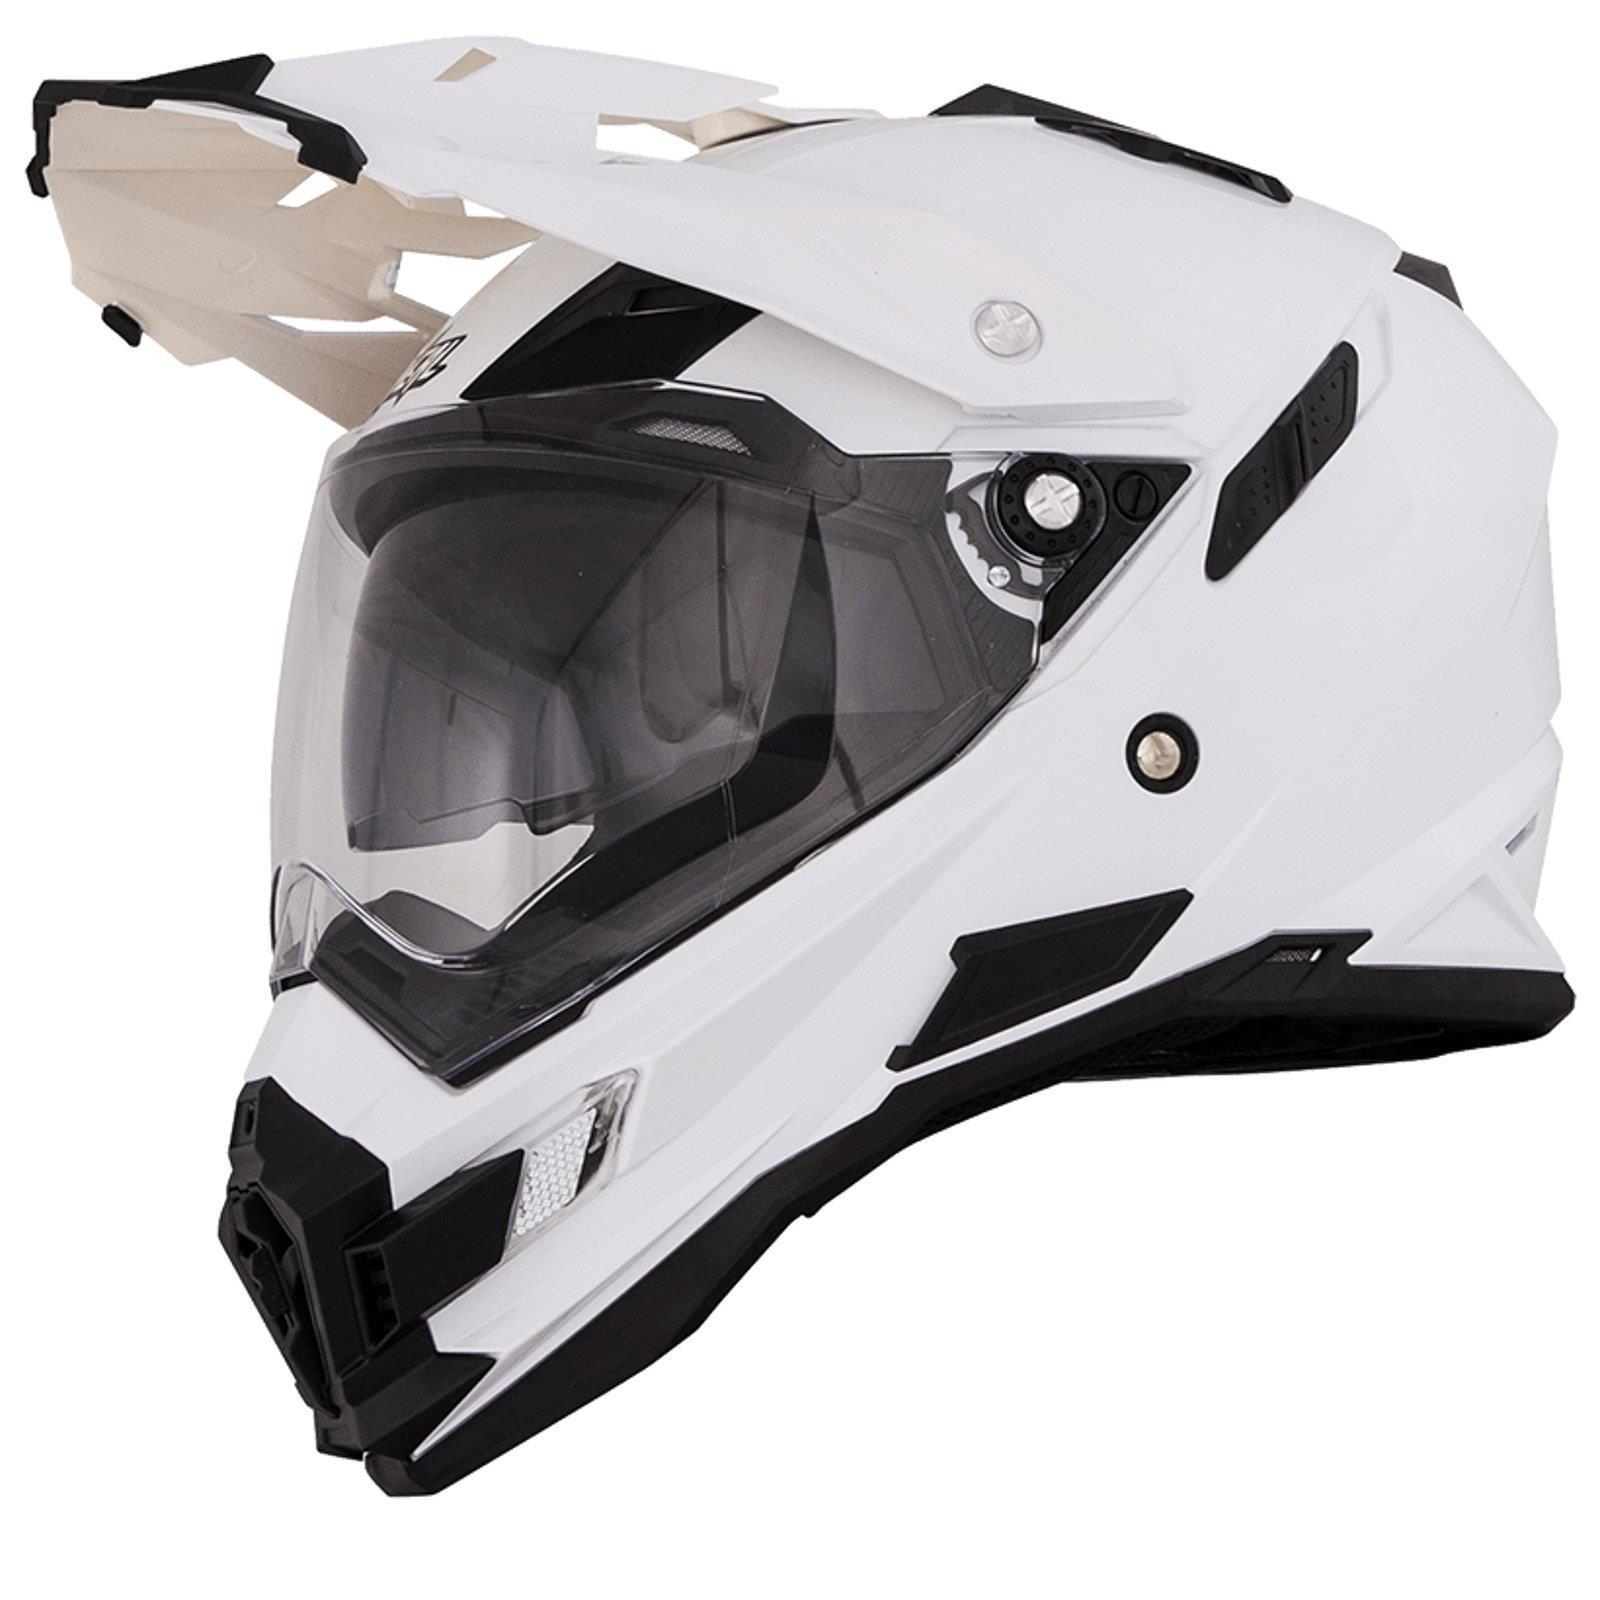 ONeal-Motocross-casco-MX-ENDURO-MOTO-BICI-FUORISTRADA-CROSS-Series-Adventure miniatura 133